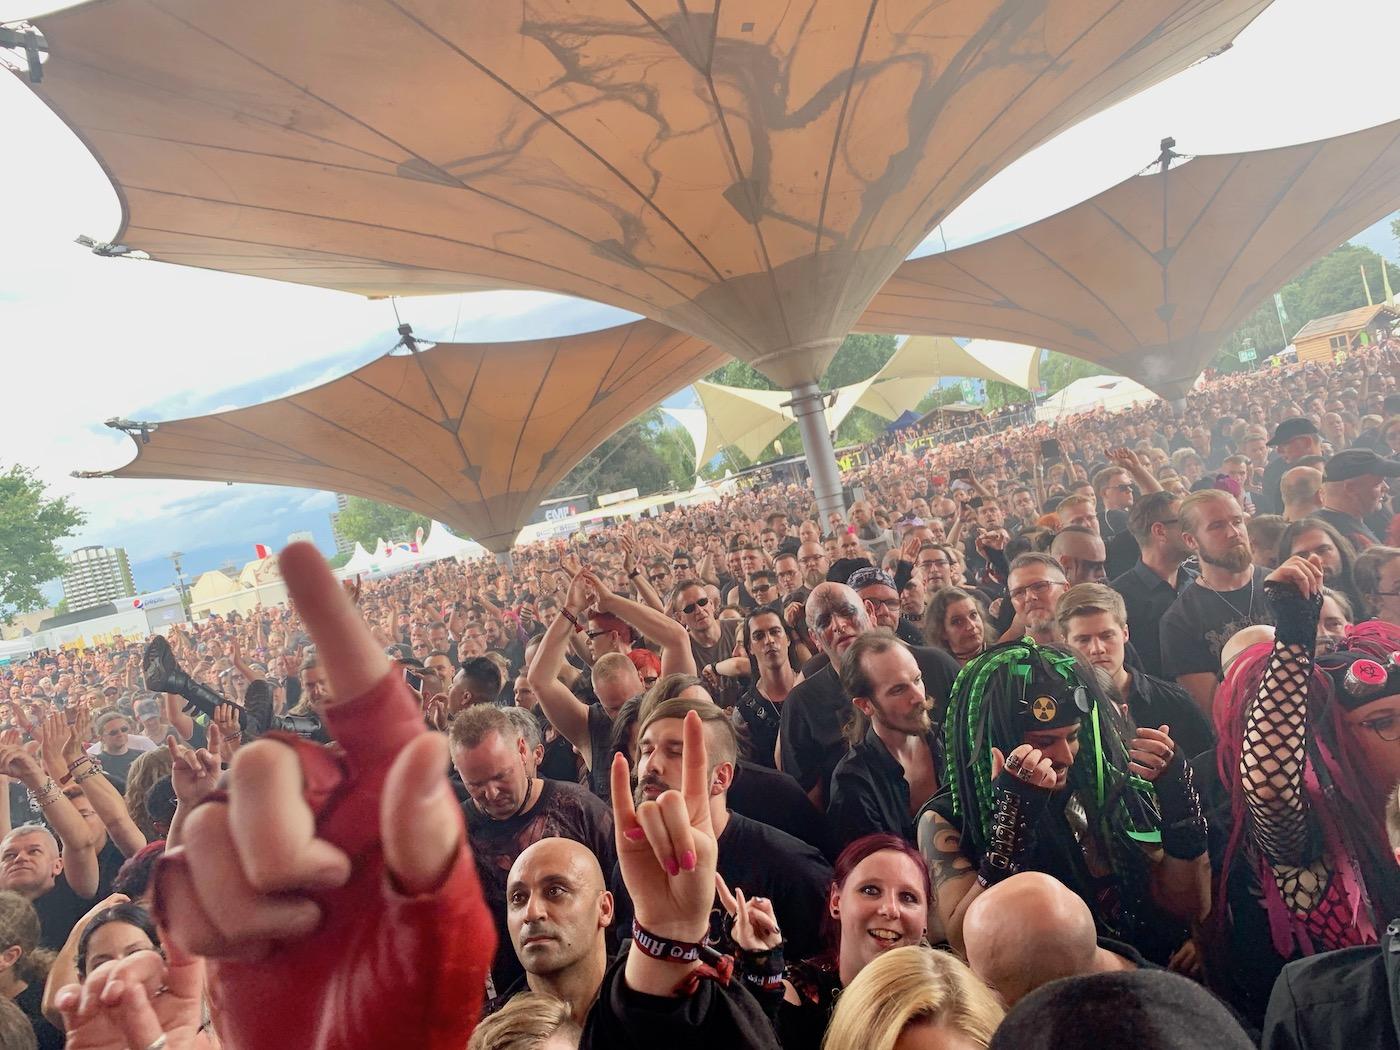 mark_benecke_amphi_festival_koeln_2019 - 51.jpg